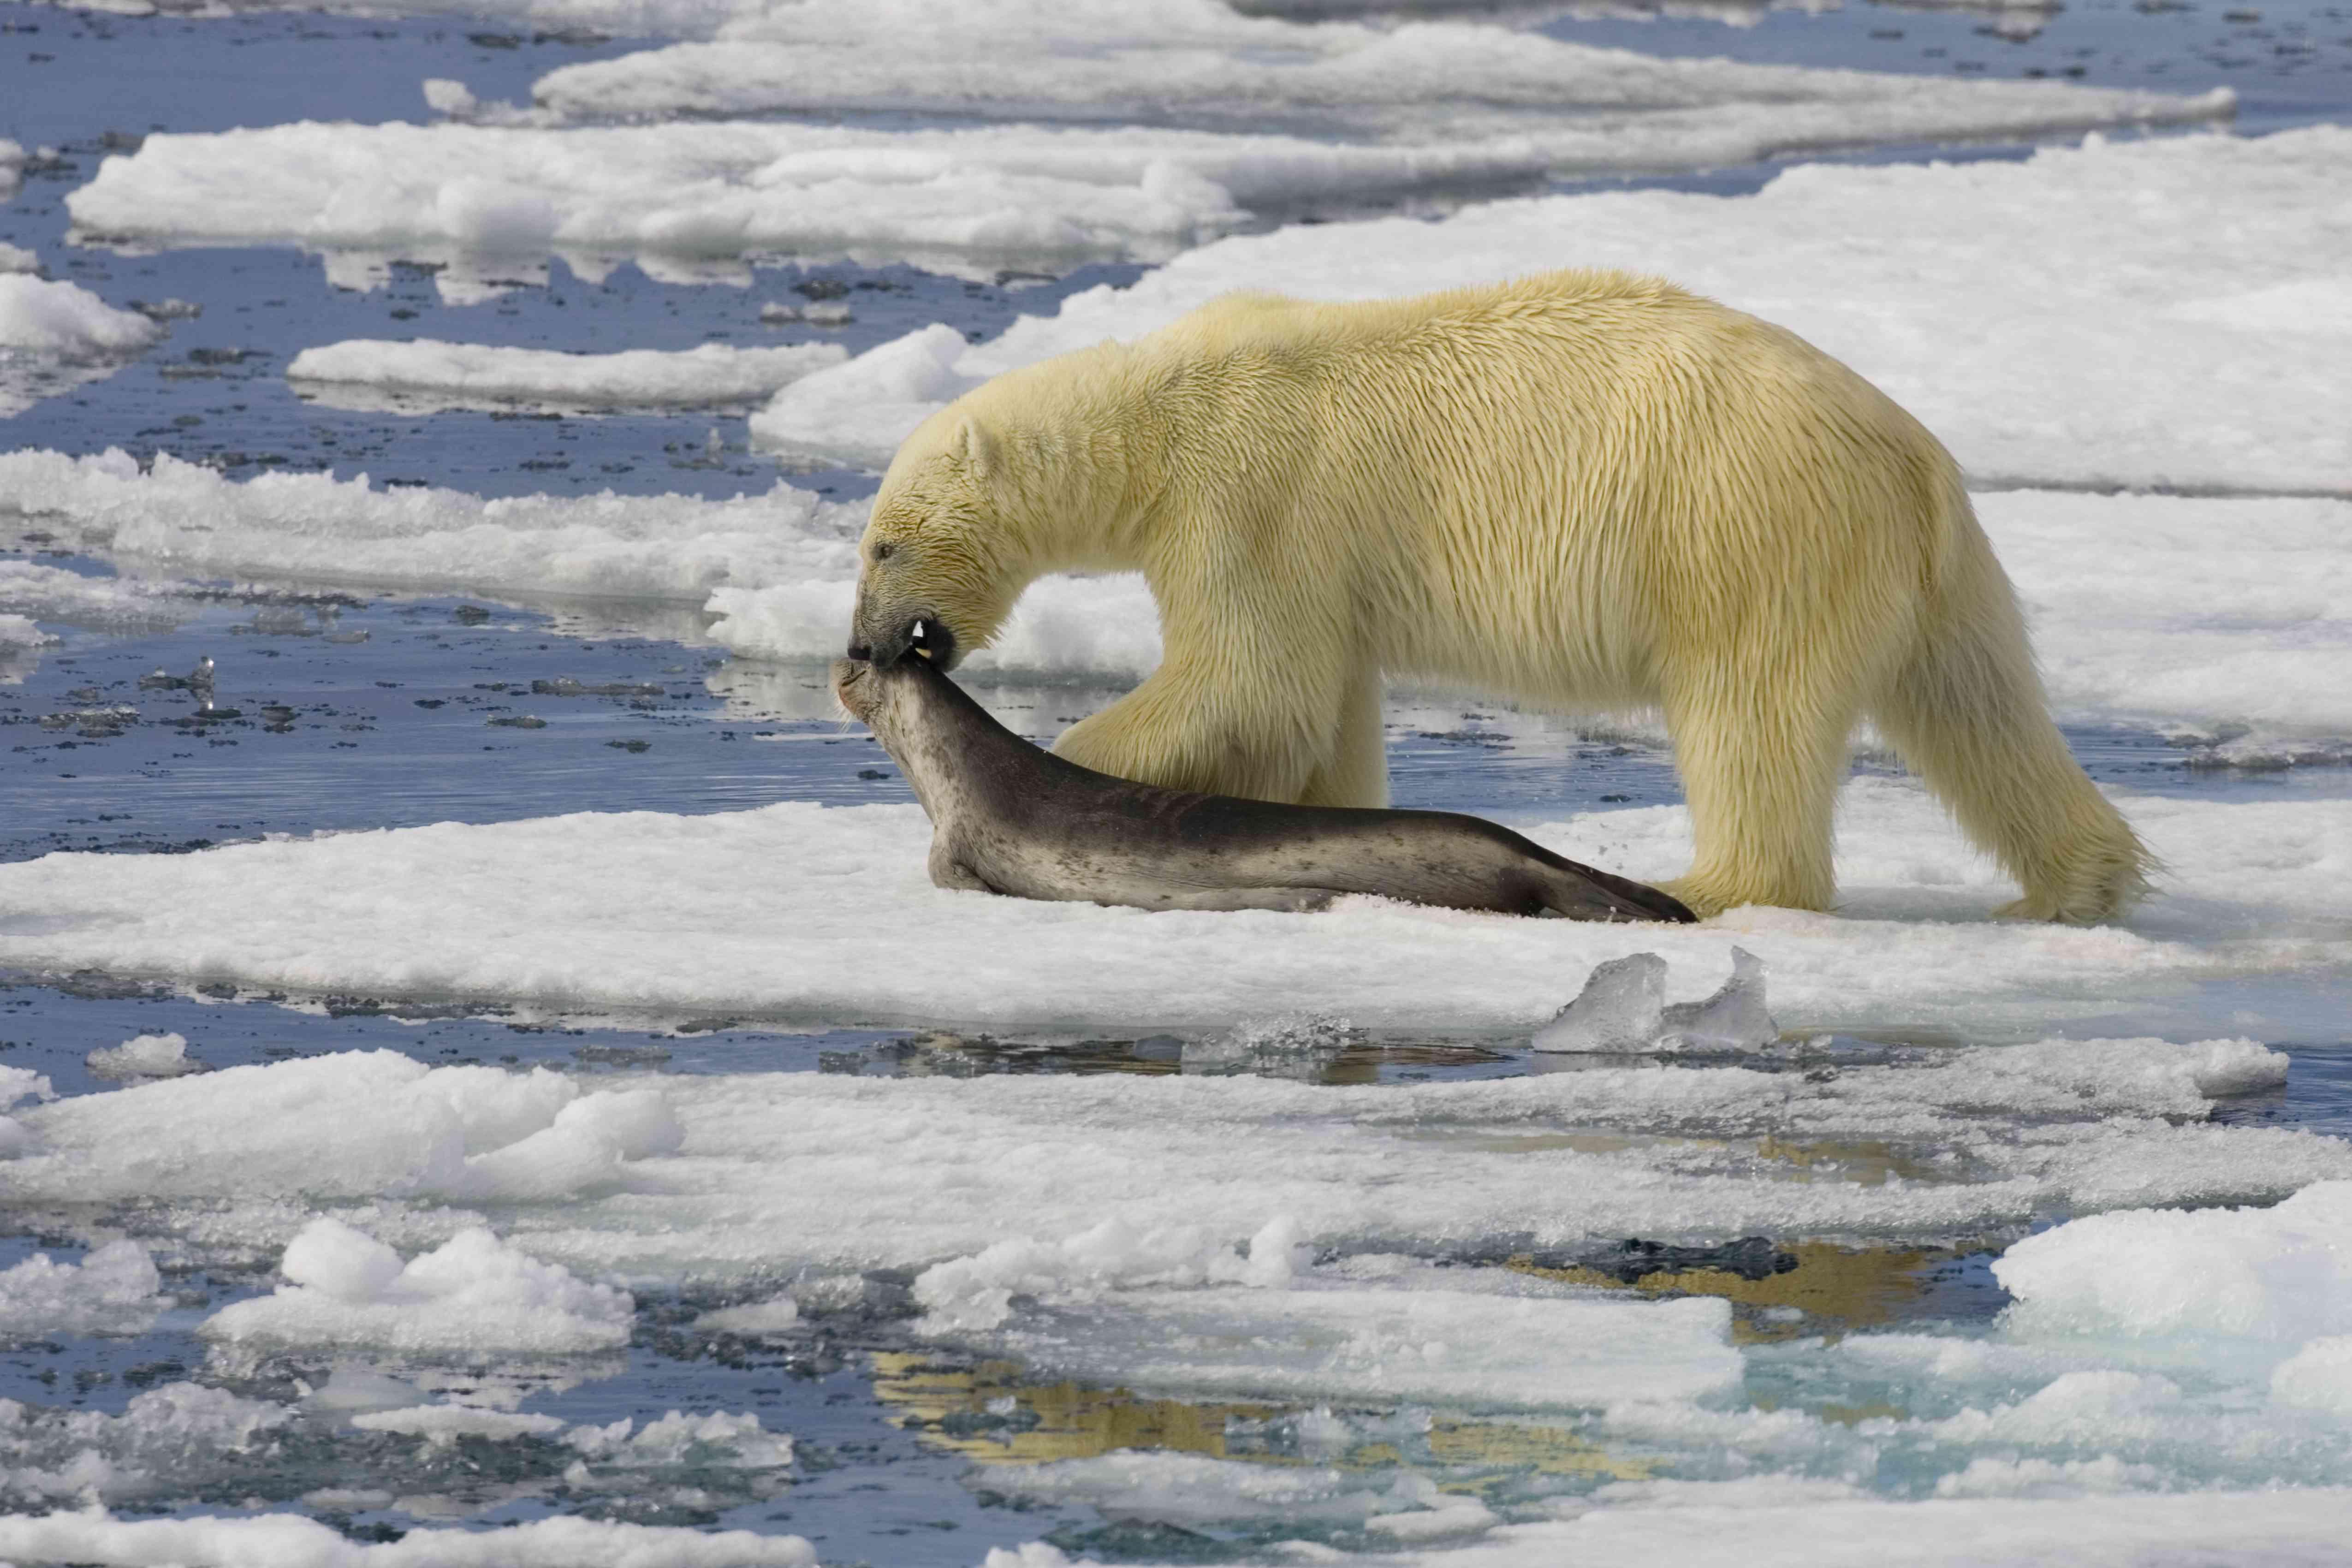 A polar bear drags a seal along a patch of Arctic sea ice.